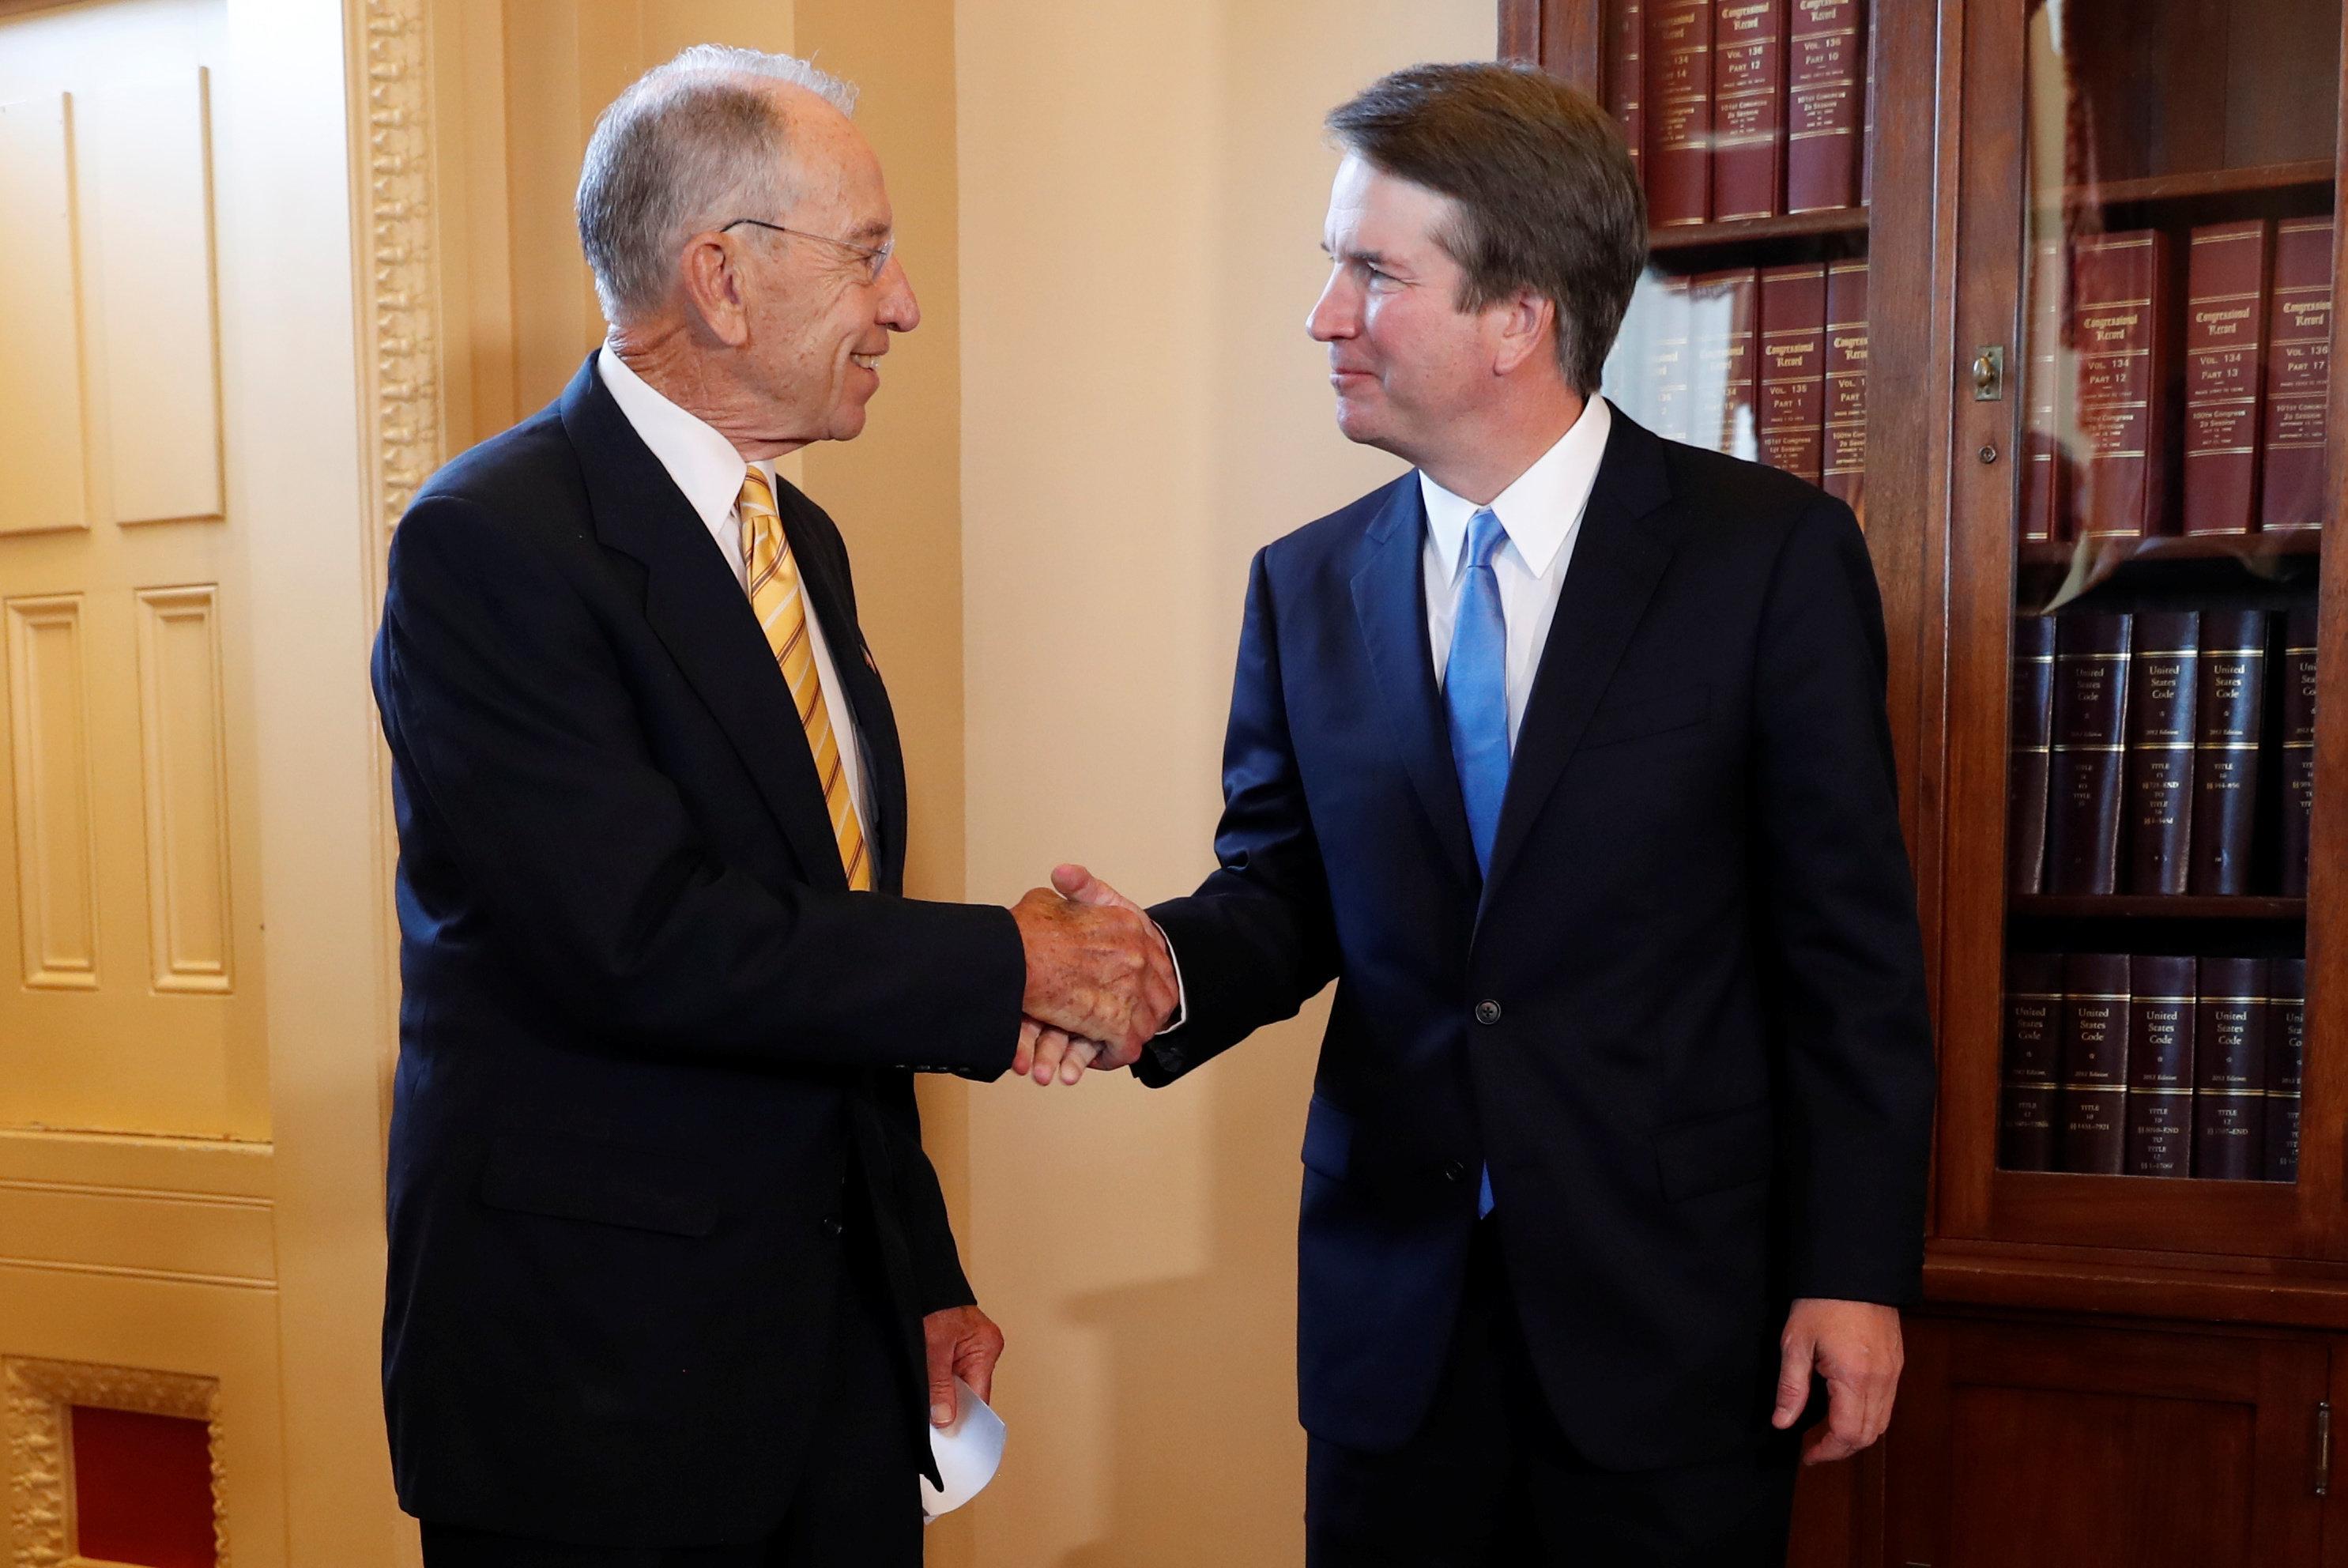 U.S. Senate Judiciary Committee Chairman Senator Chuck Grassley greets Supreme Court nominee Judge Brett Kavanaugh before a meeting at the U.S. Capitol on Capitol Hill in Washington, U.S., July 10, 2018. REUTERS/Leah Millis